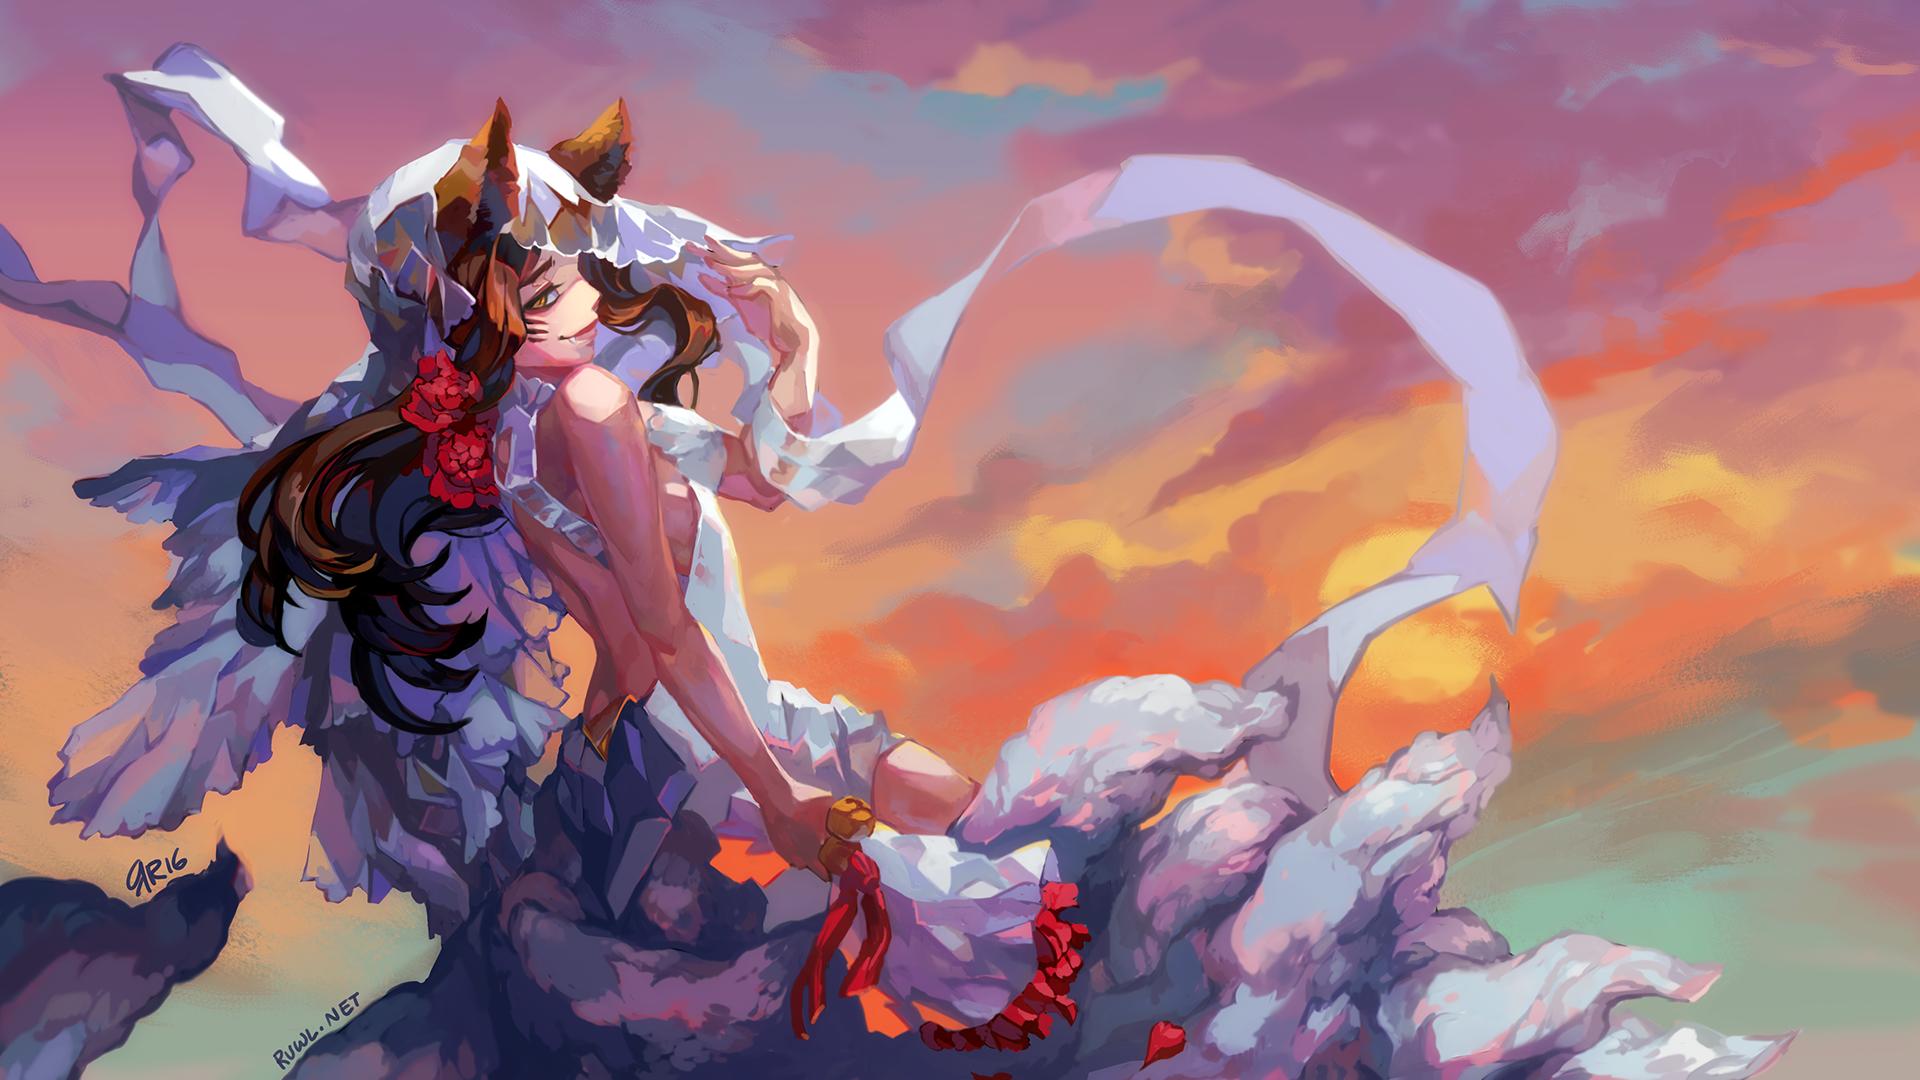 Wallpaper Ahri, League of legends, gaming